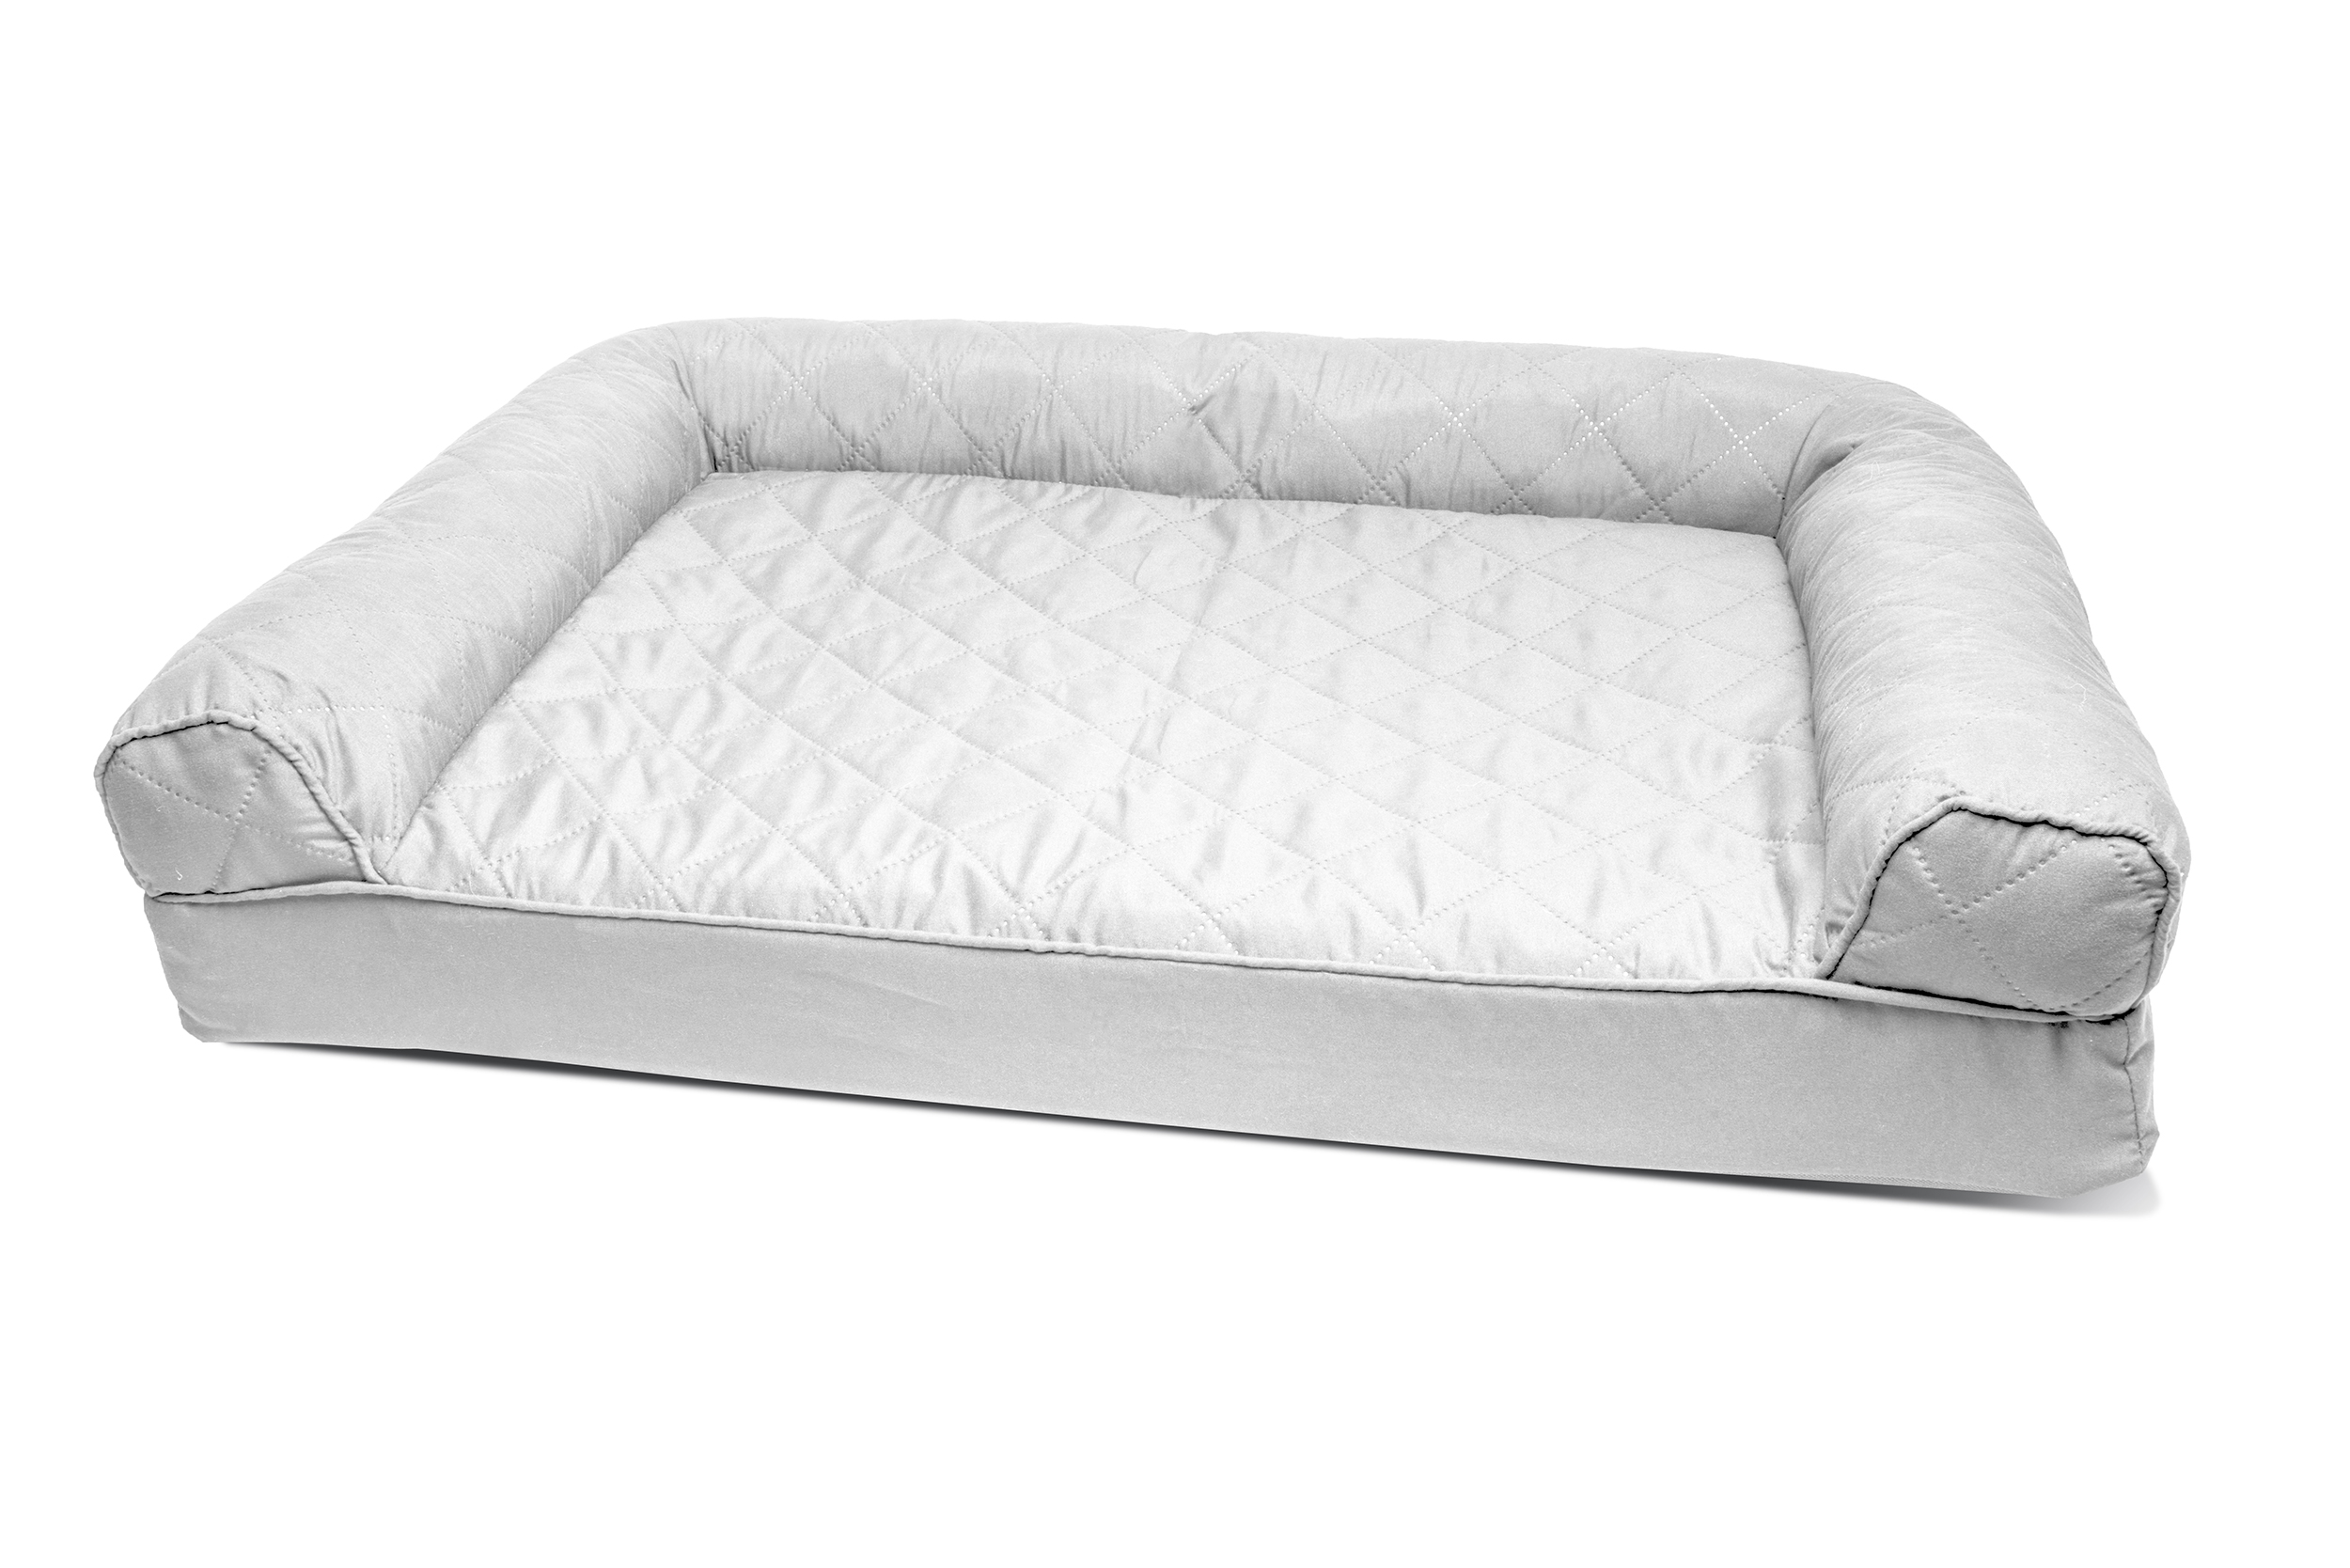 cat tunnel sofa price furniture set karachi furhaven quilted orthopedic dog bed jumbo 2017